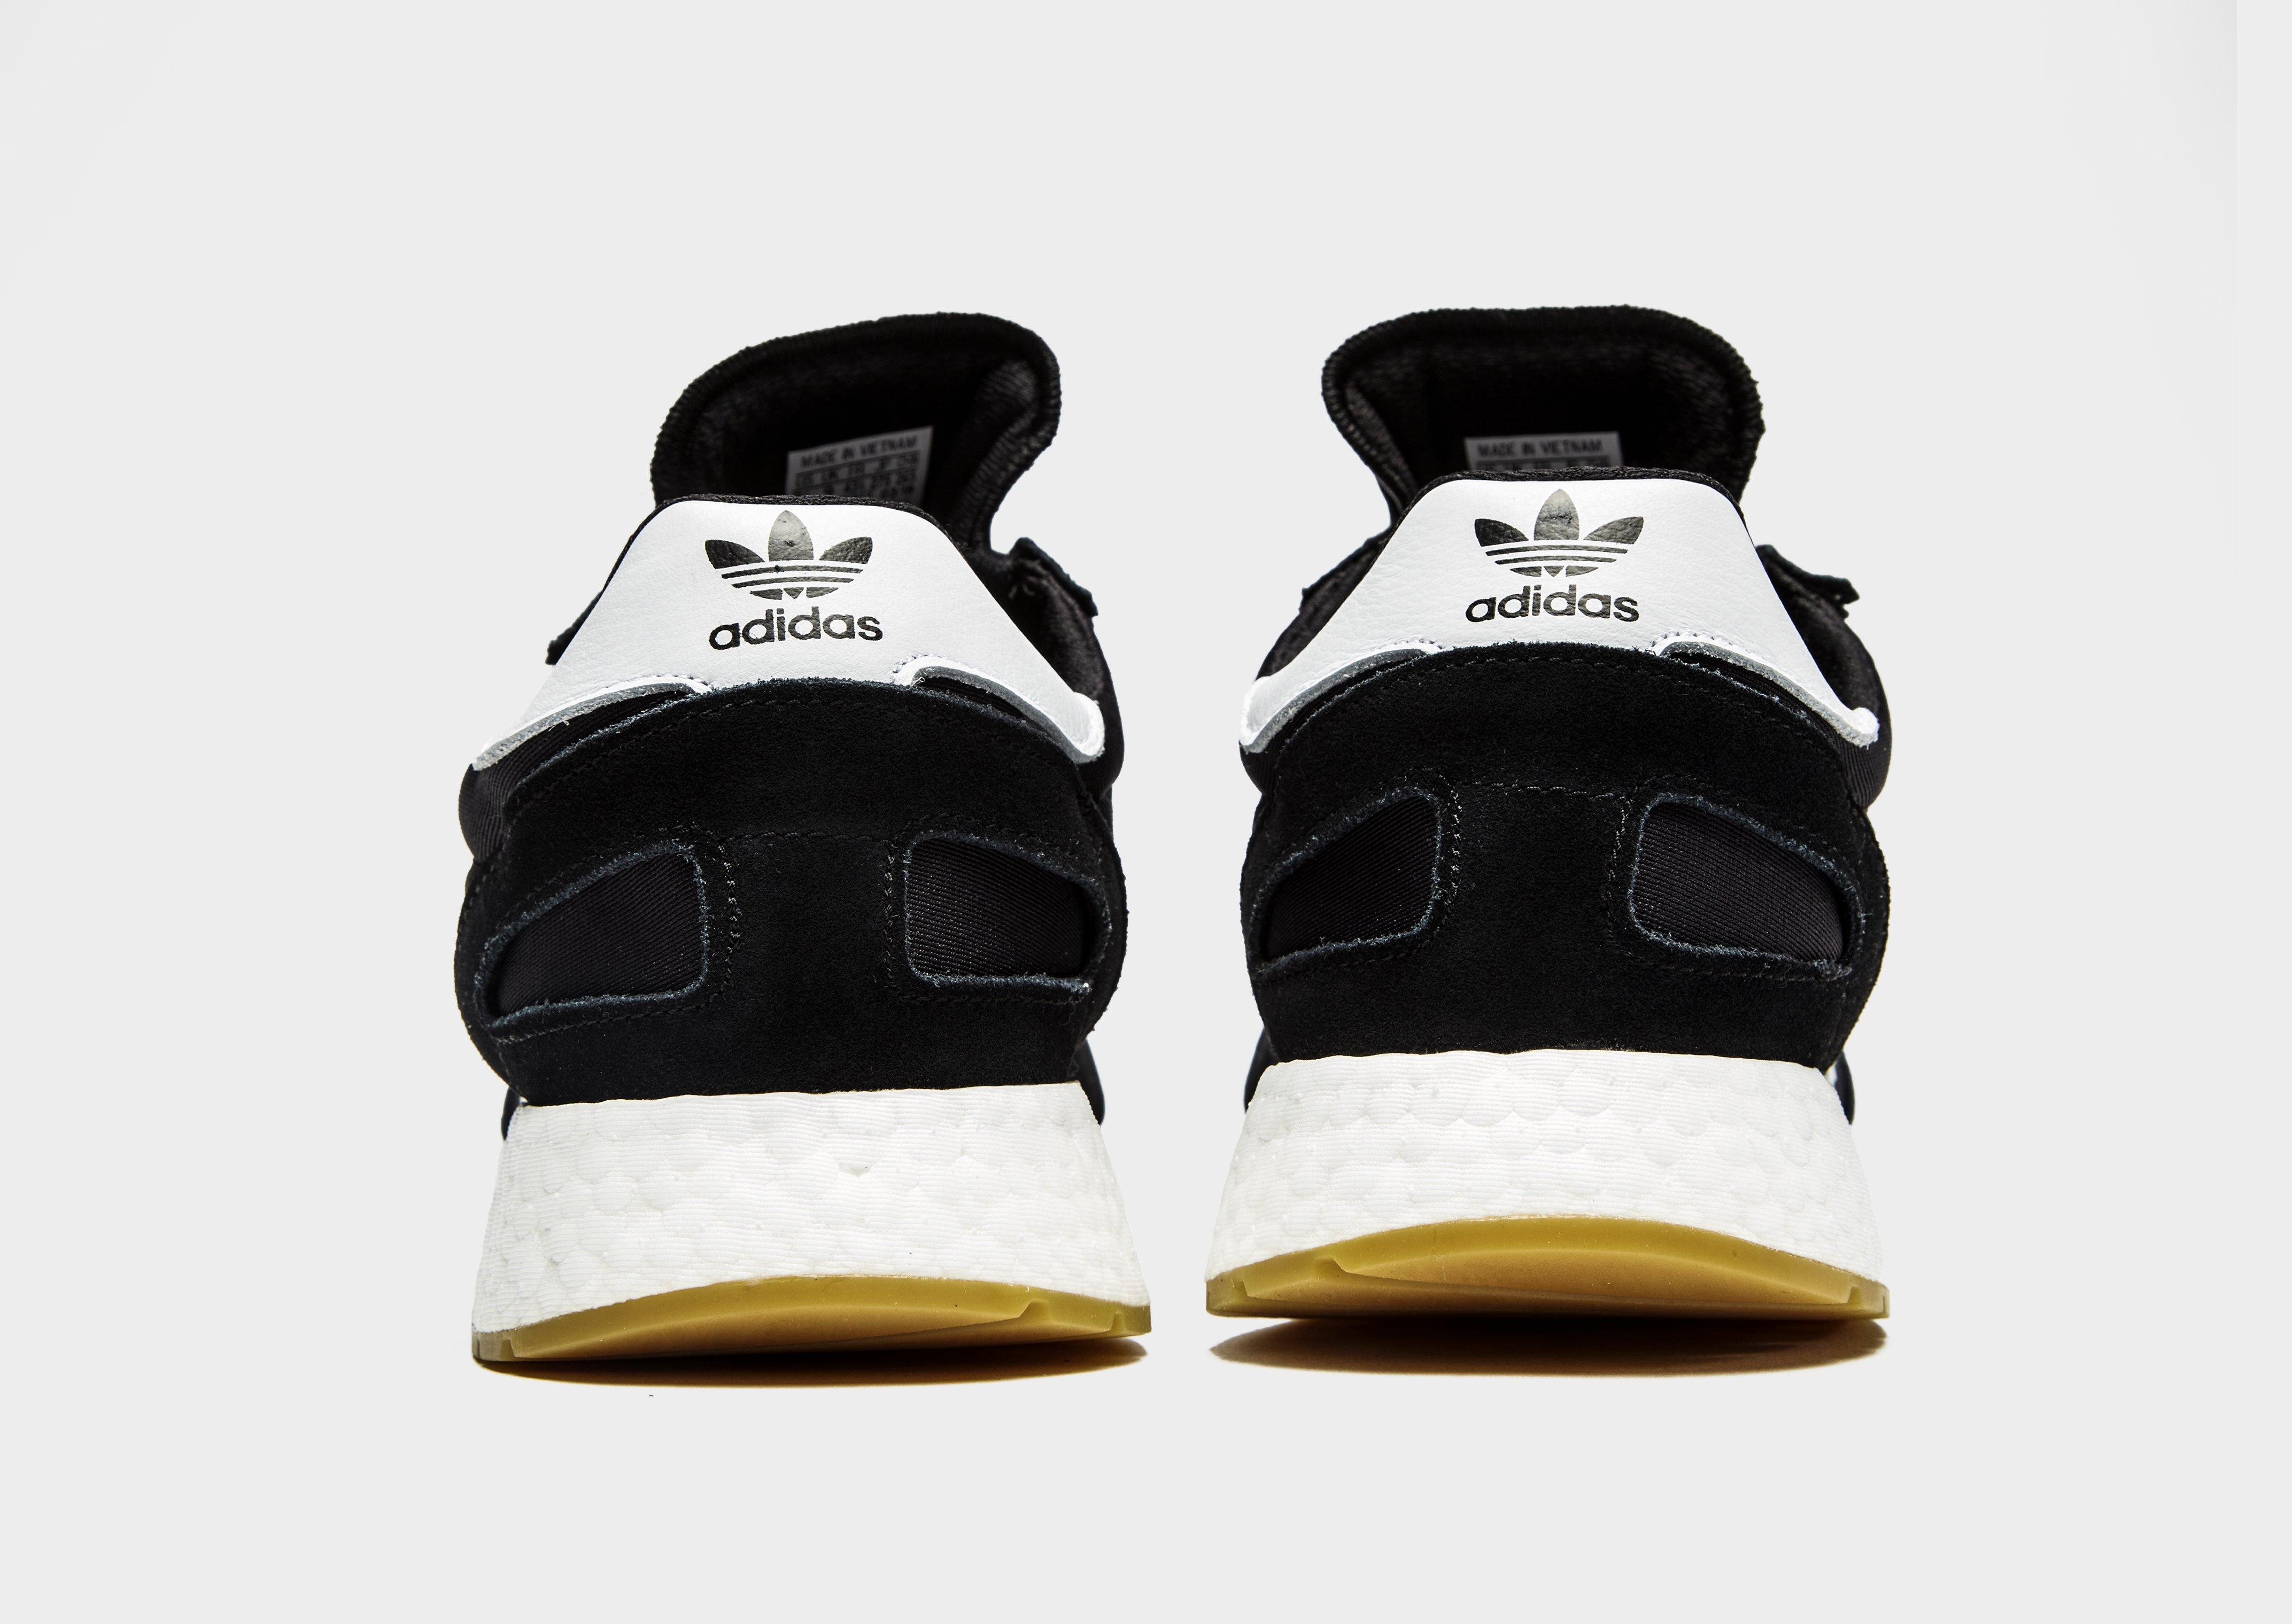 best loved dffb4 70329 Lyst - Adidas Originals I-5923 Boost in Black for Men